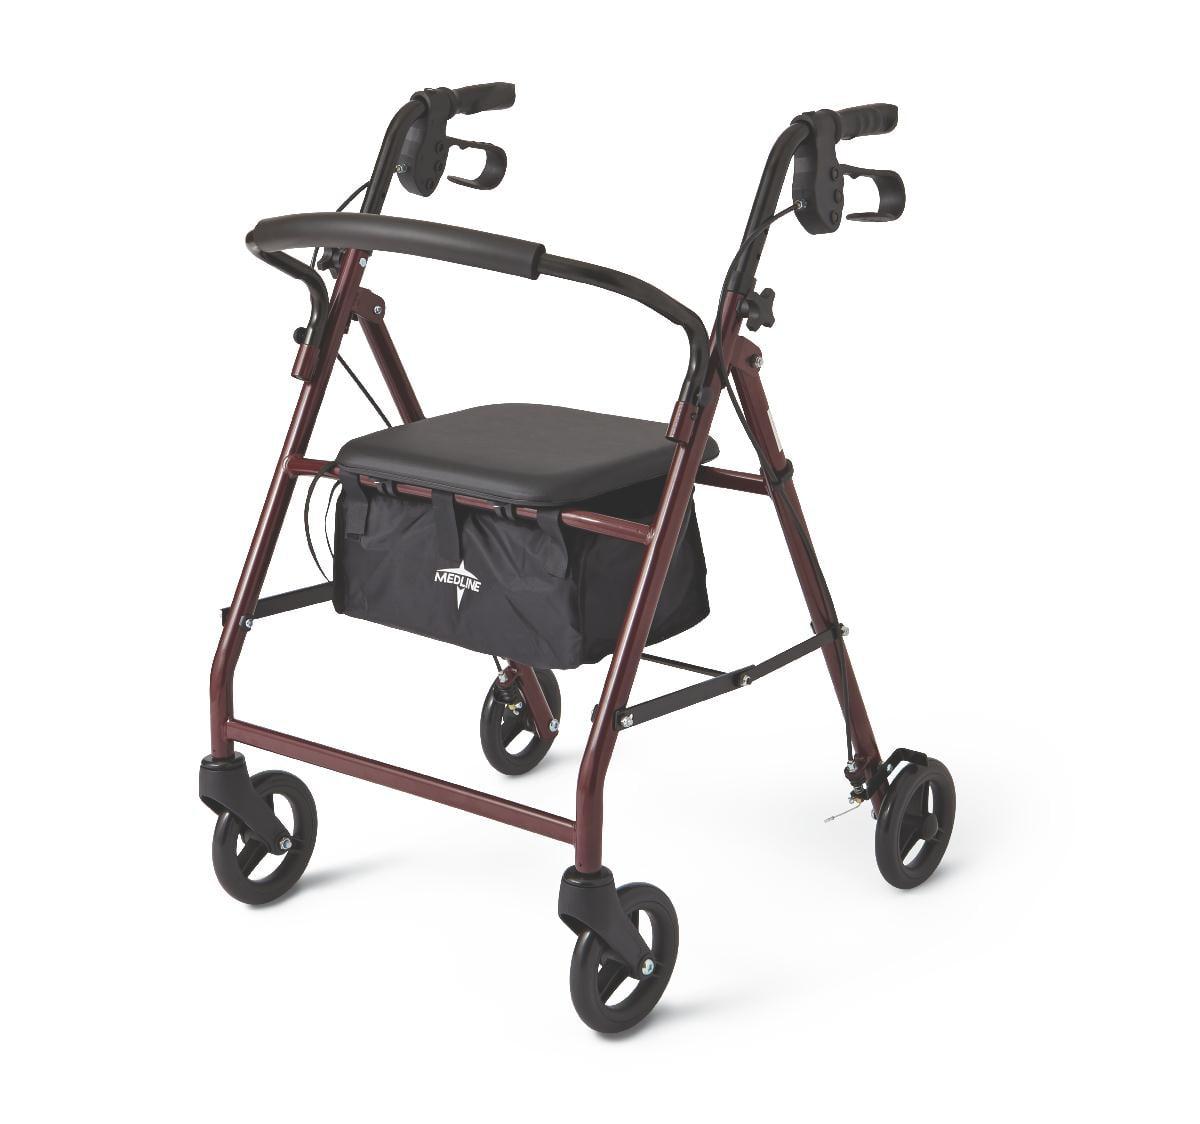 Basic Steel Rollators - MDS86850ES